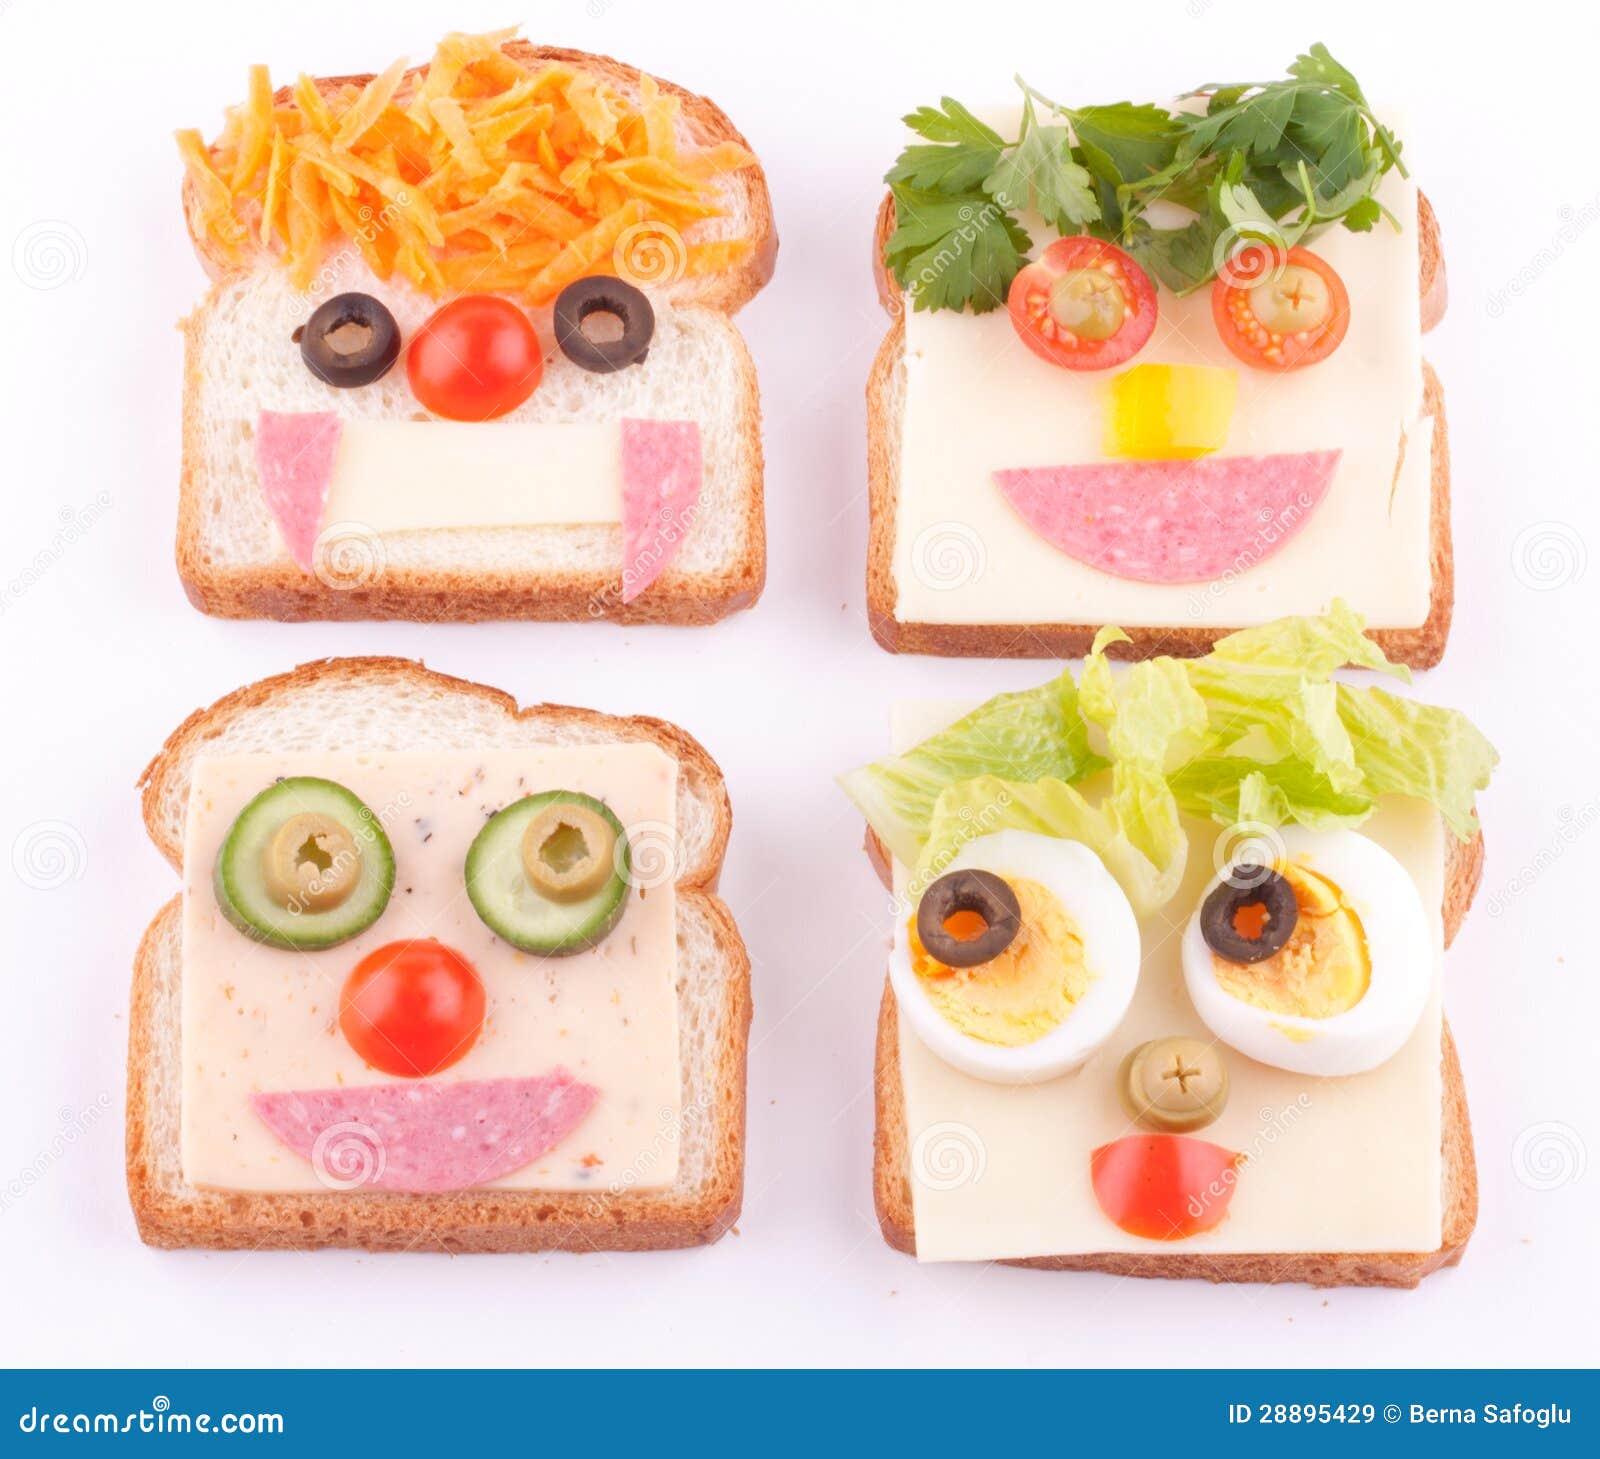 Face on bread